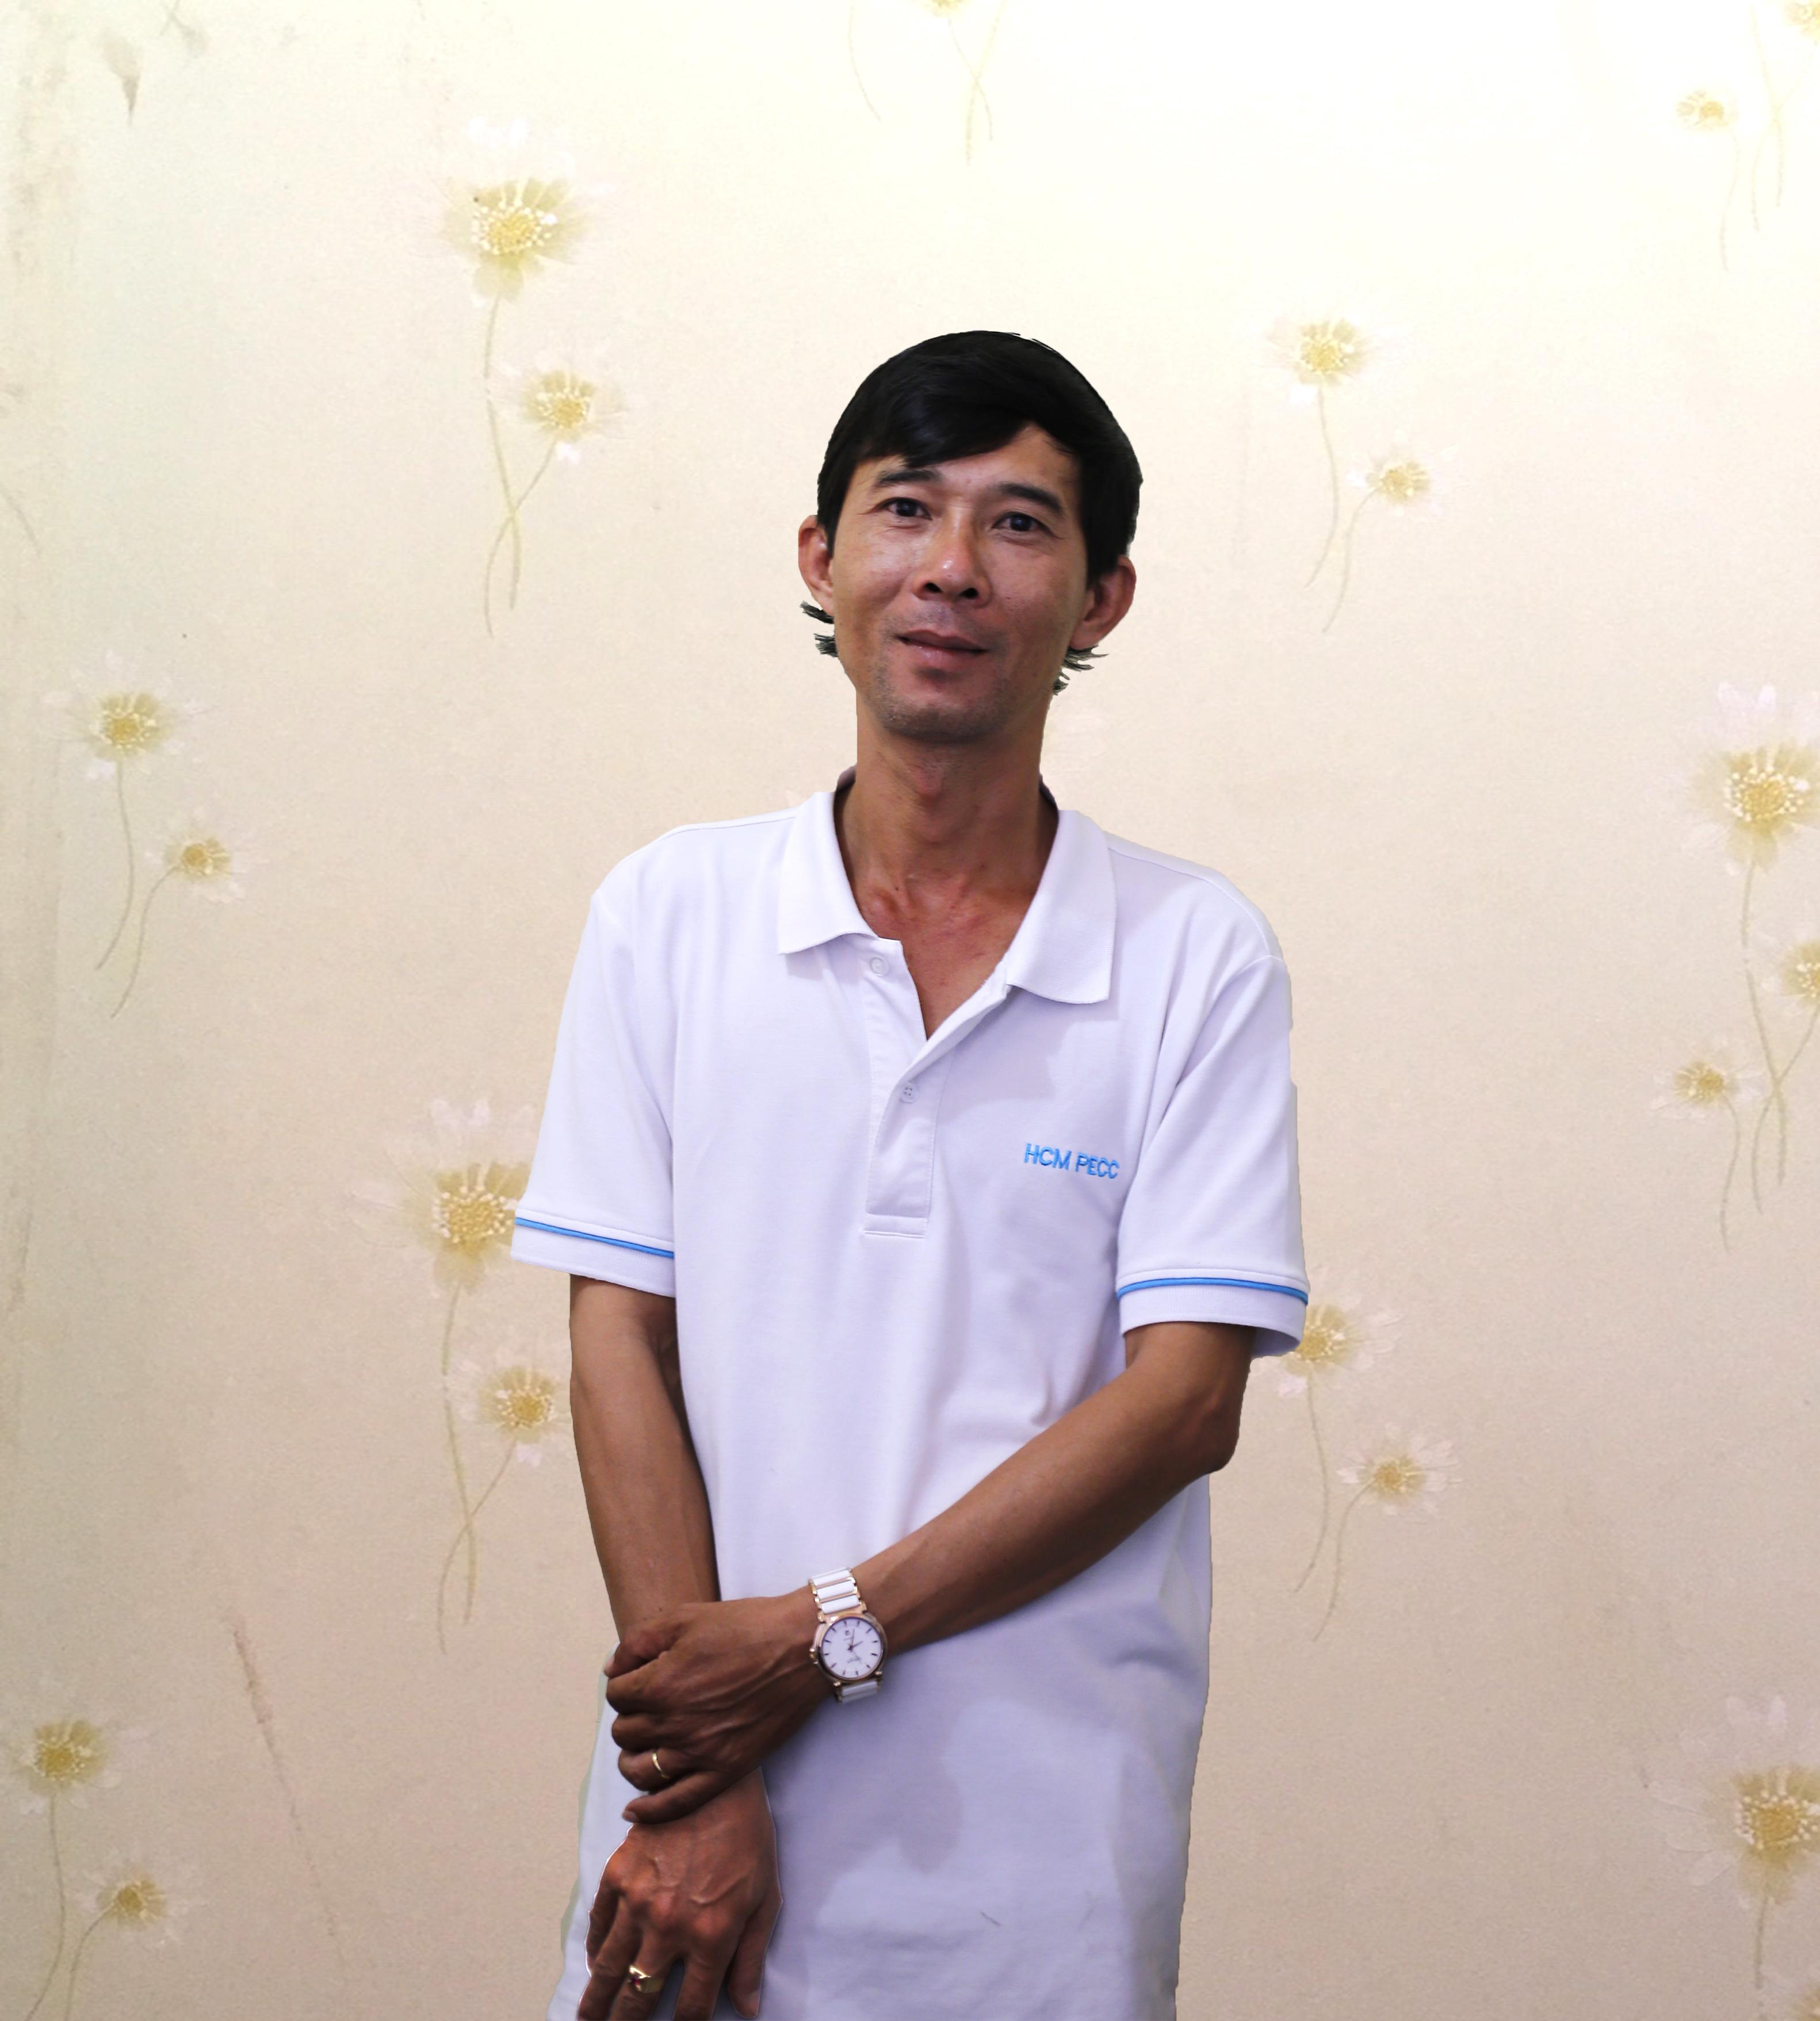 Huỳnh Huy Cường